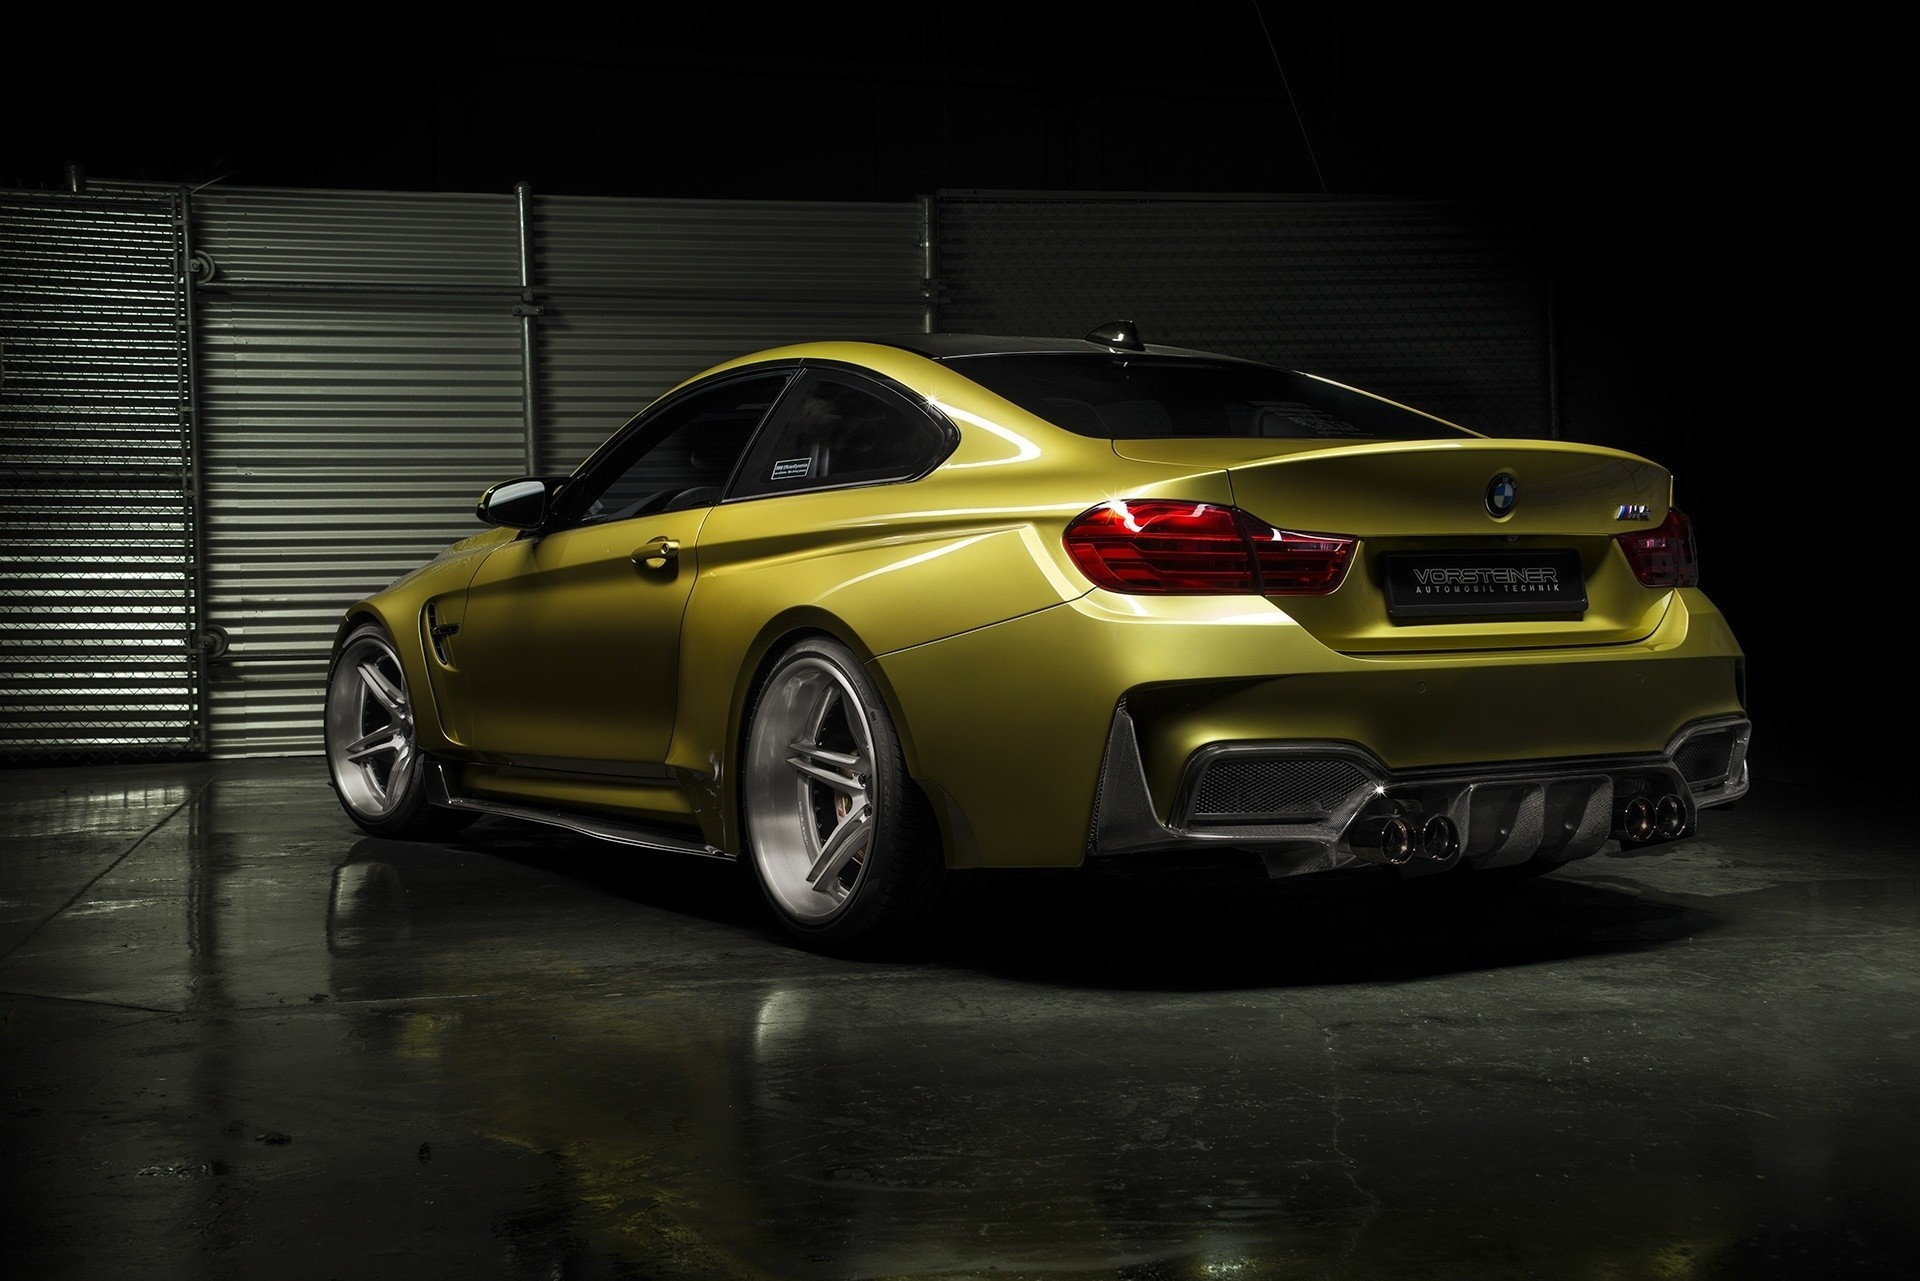 BMW M4 (Golden) - BMW ///M Photo (40273451) - Fanpop